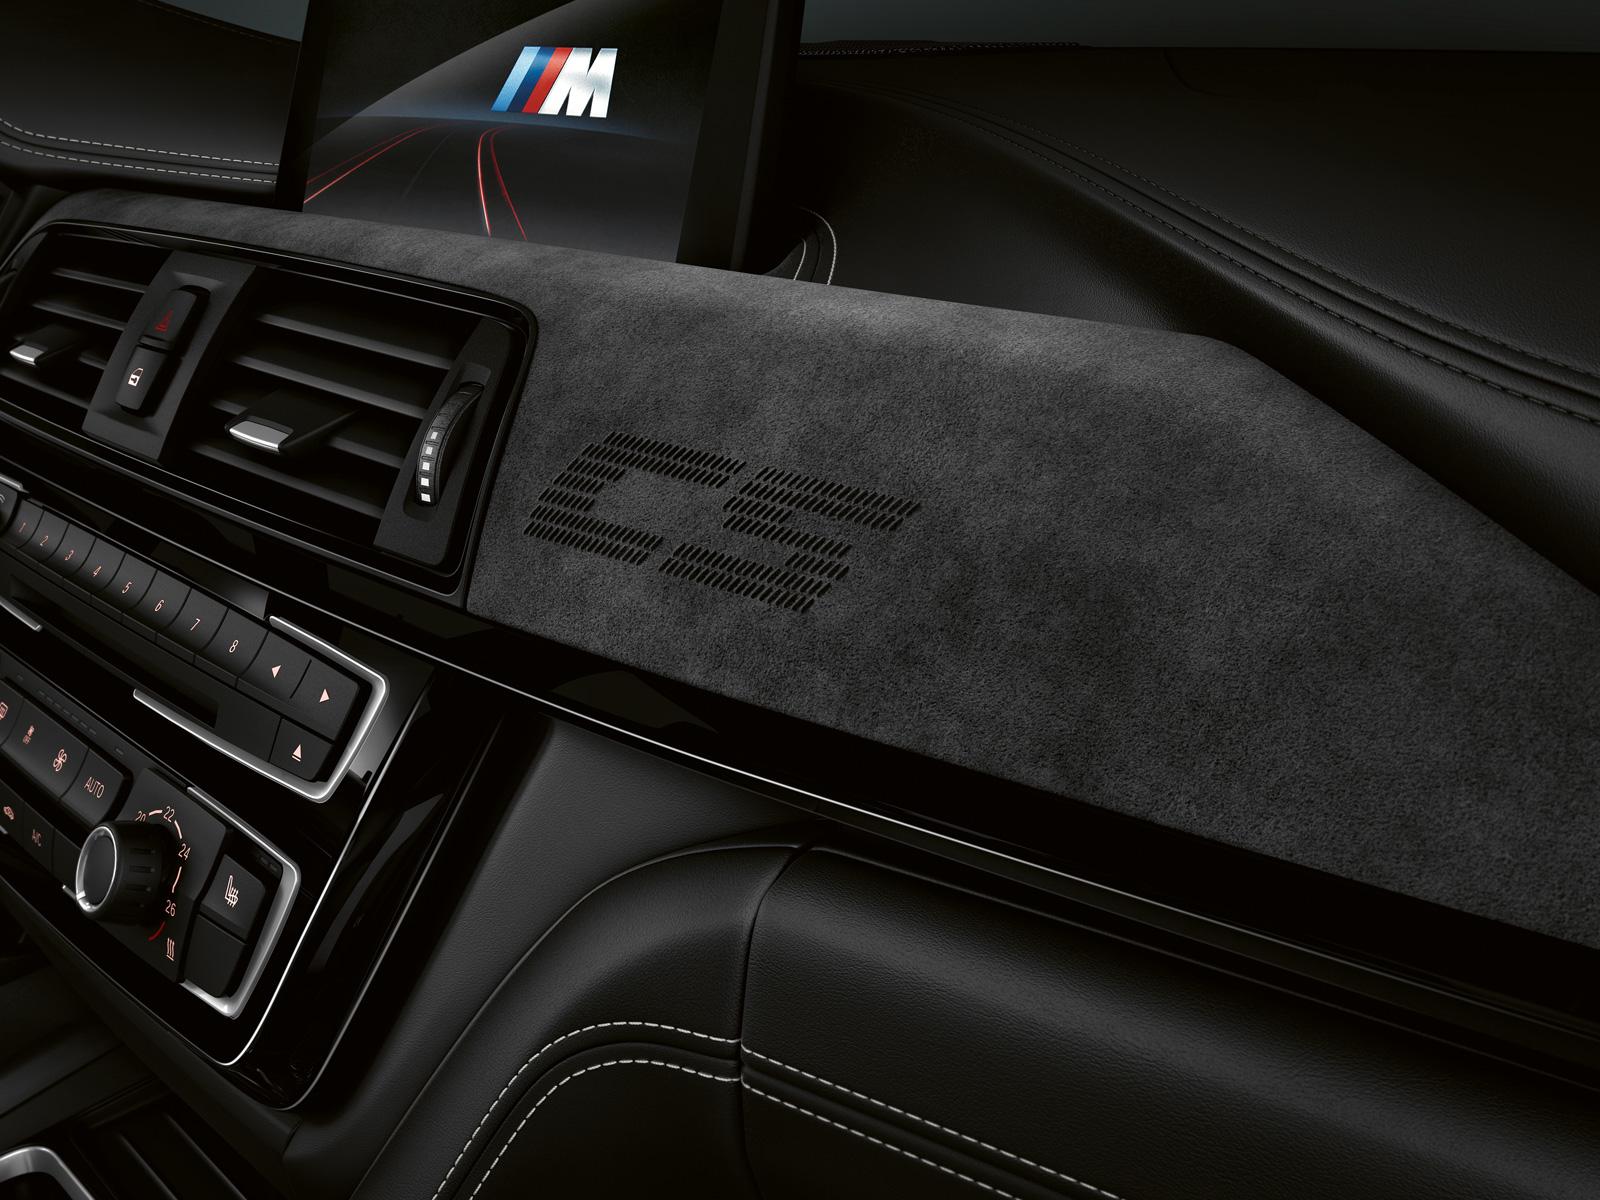 بامو M3 CS: سبک، سریع و پرشتابترین خودروی سری 3